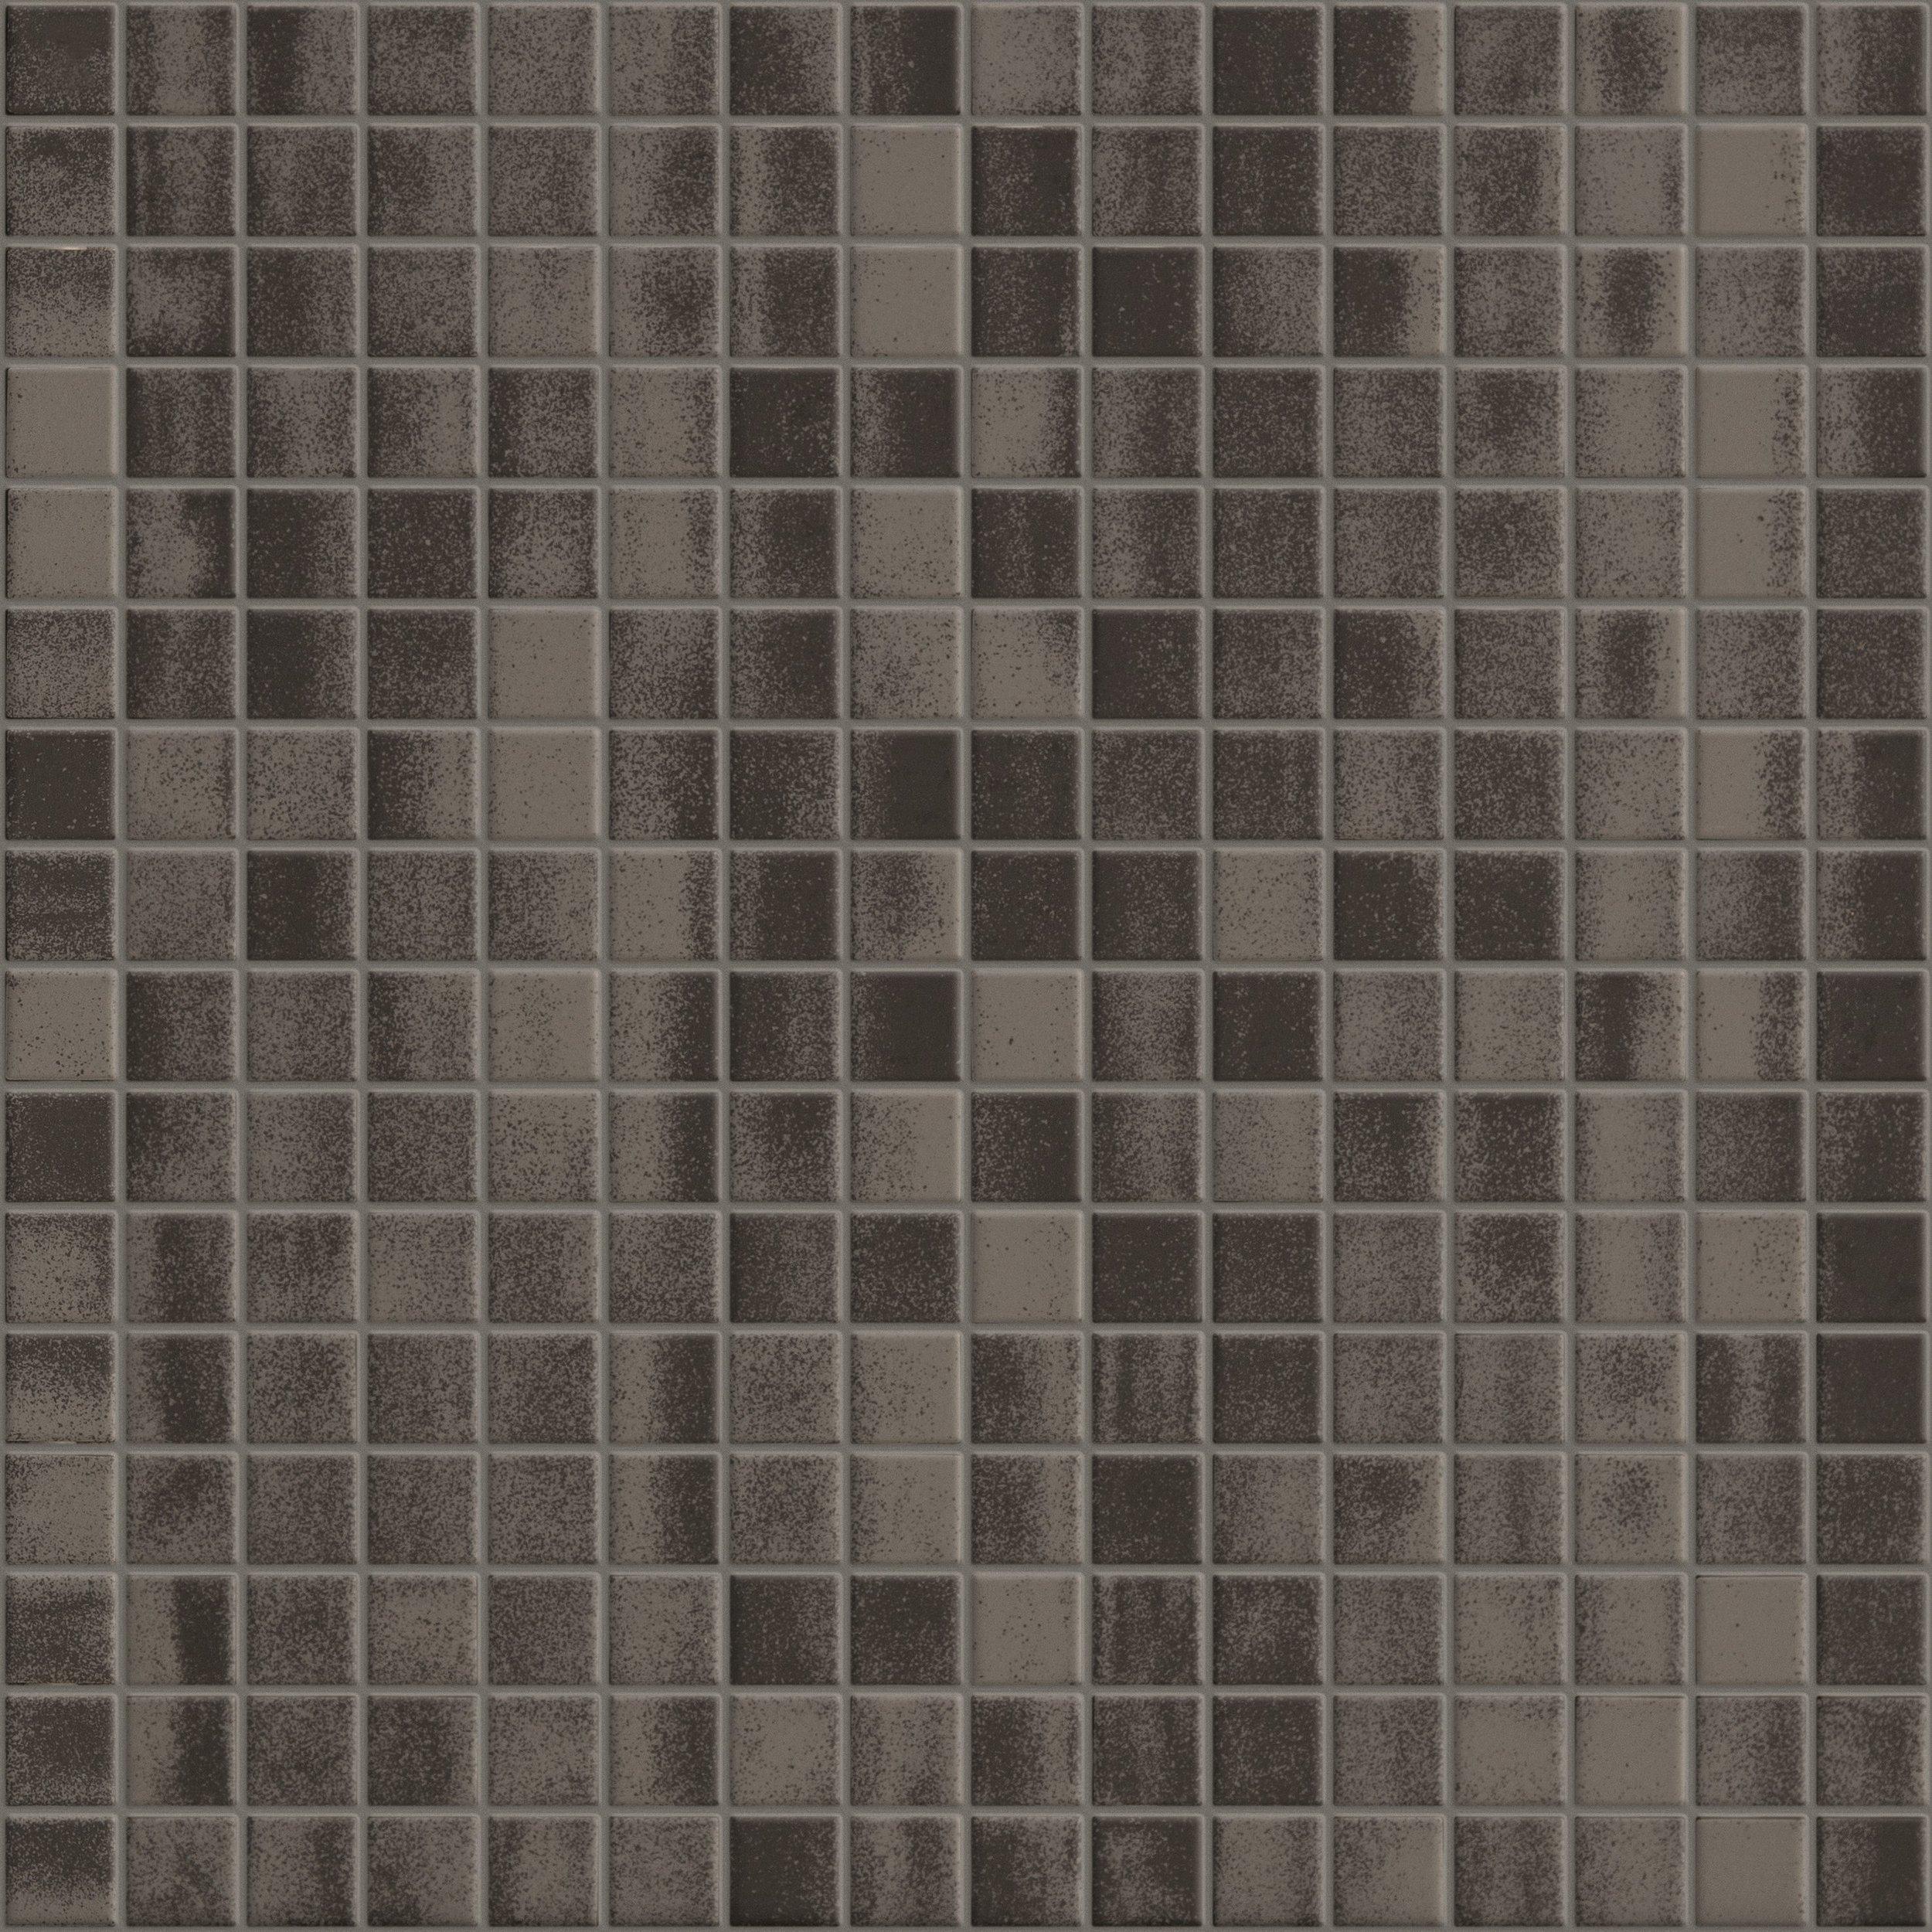 MosaicoMix_Clay-Mud_FOGLIO.jpg